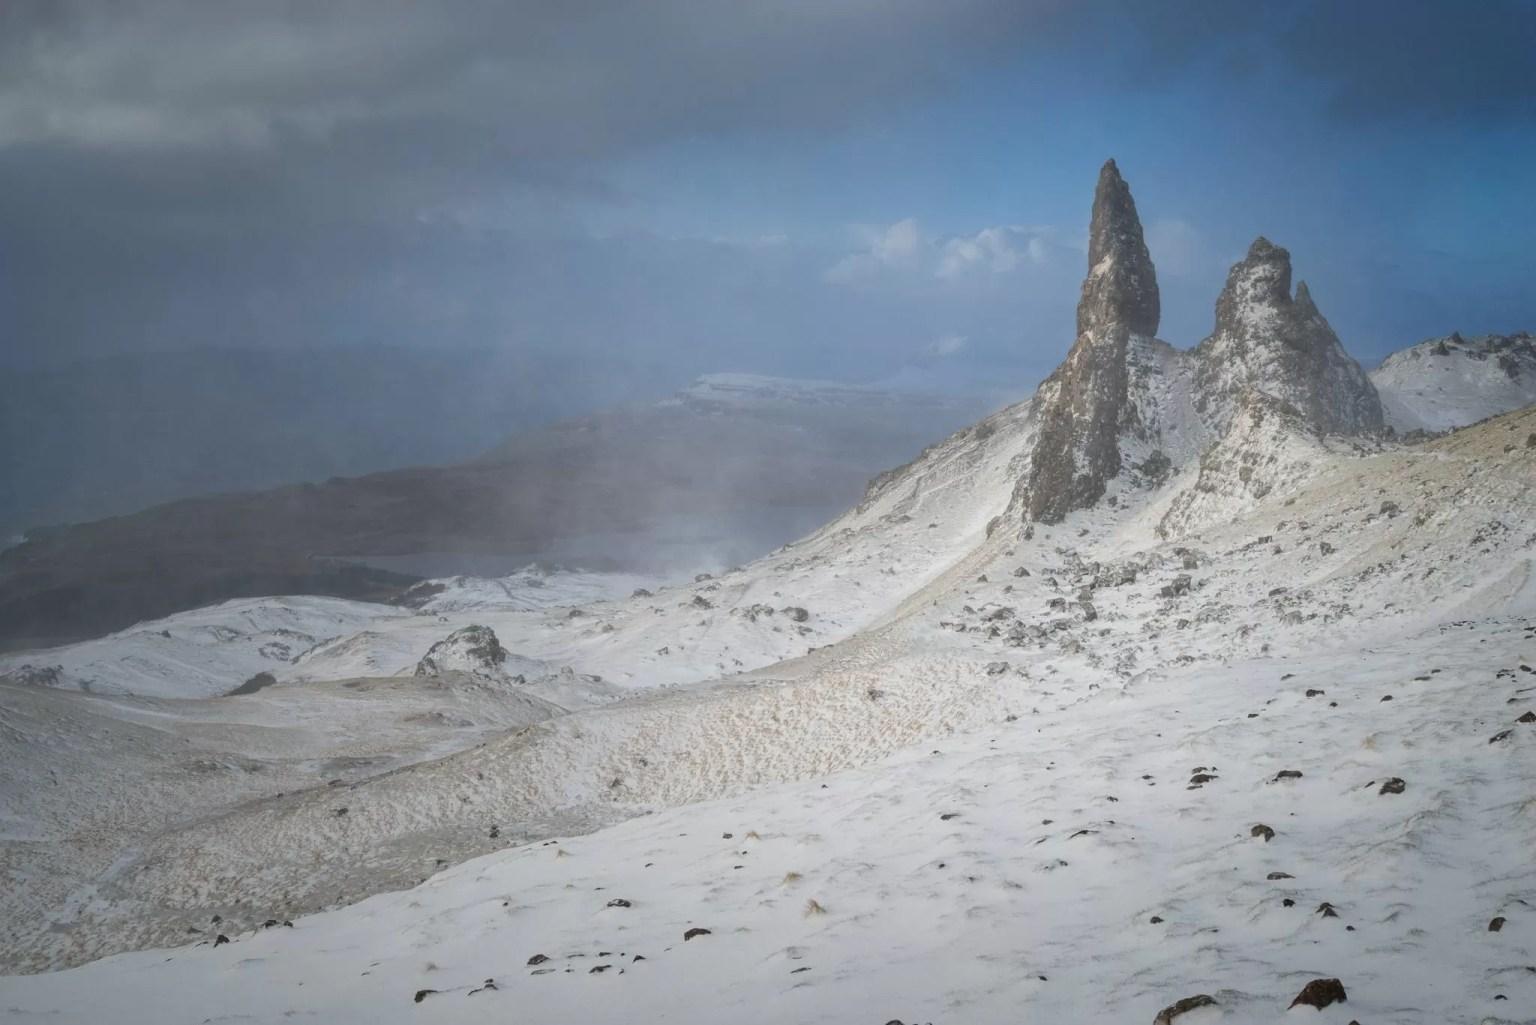 Old Man of Storr Winter Sunrise - Isle of Skye Photography Workshop